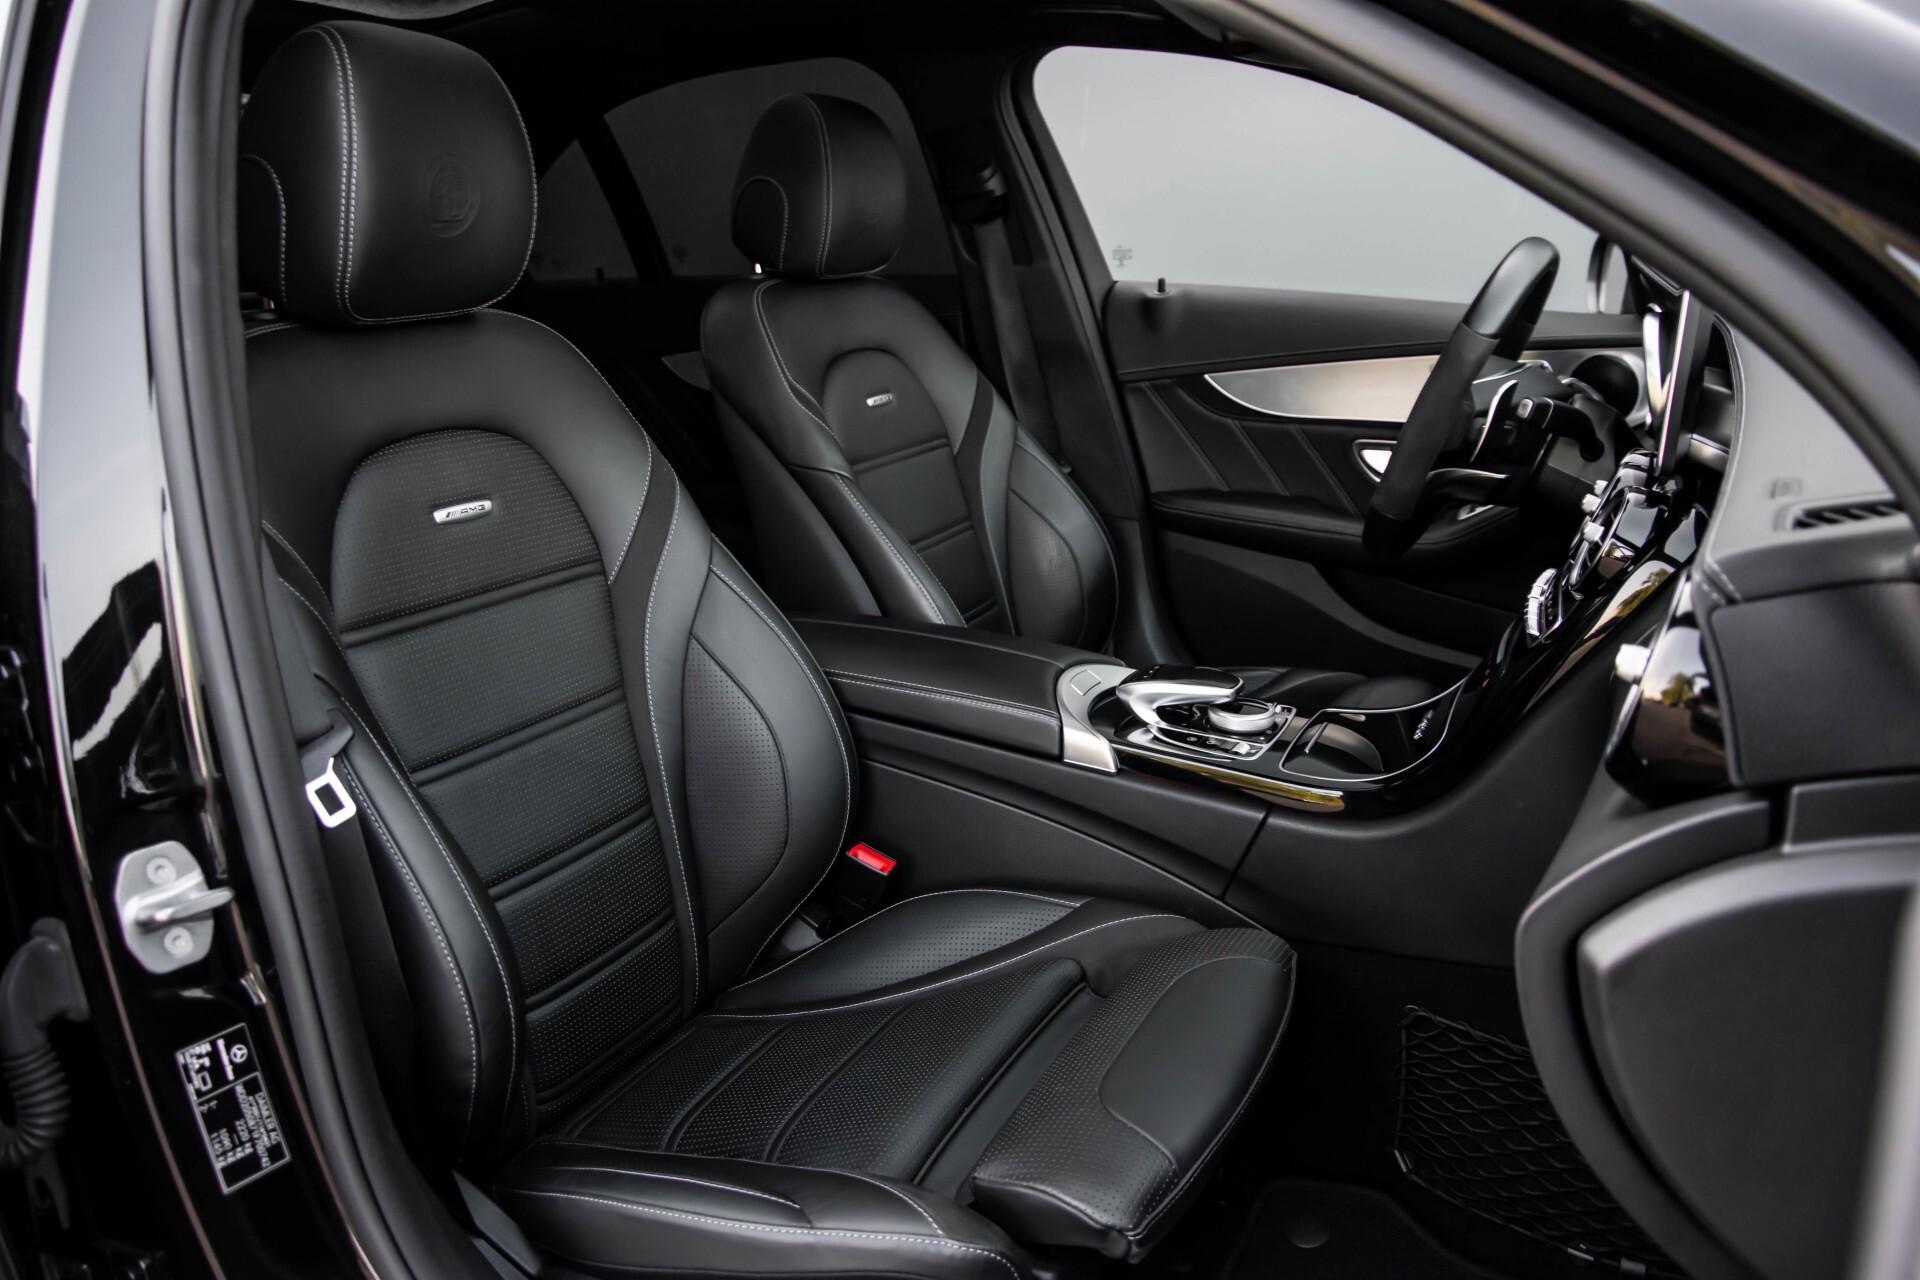 Mercedes-Benz C-Klasse 63 AMG S Panorama/Distronic/Keyless/Comand/Camera/ILS Aut7 Foto 3